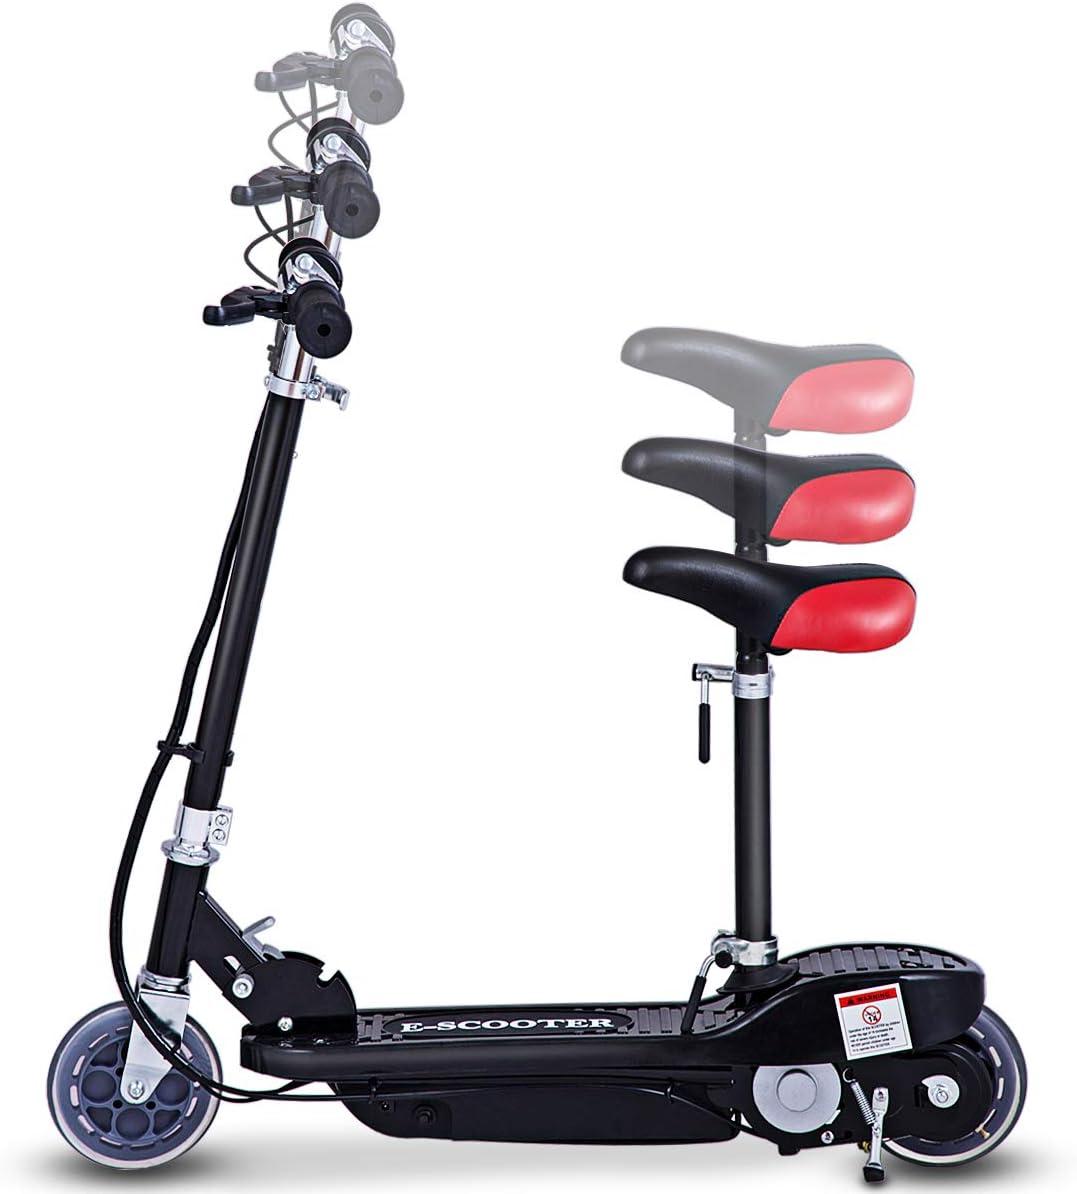 Amazon.com: Patinete eléctrico Costzon, patinete ligero de ...